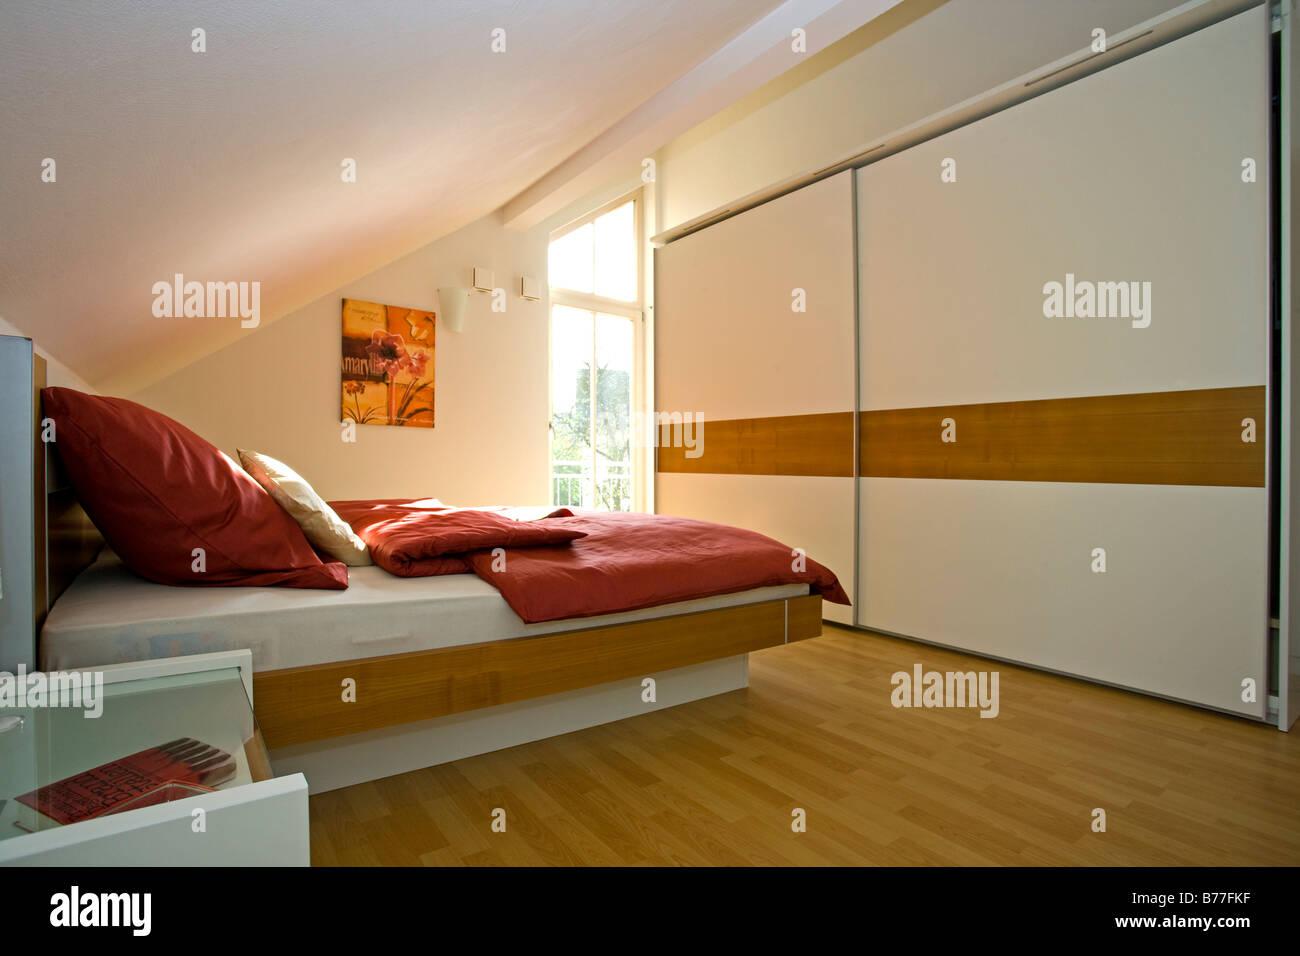 Modernes Schlafzimmer, modern bedroom Stock Photo: 21678931 - Alamy